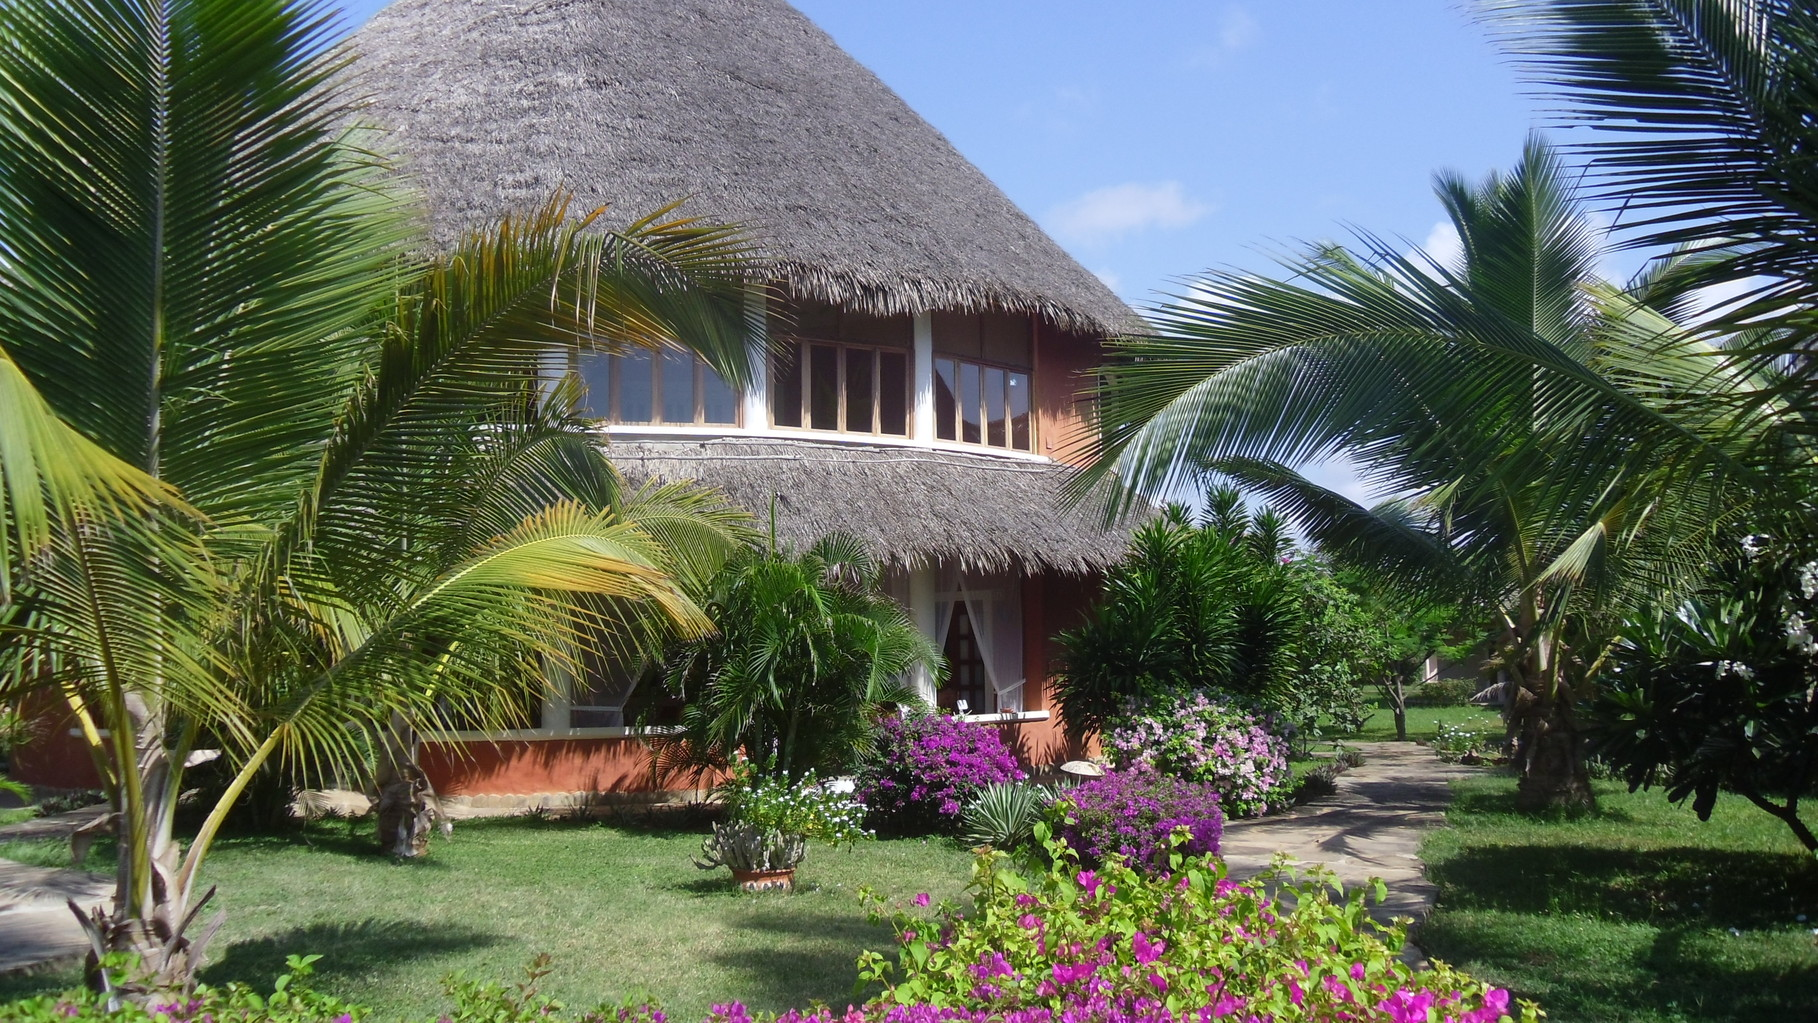 Holiday House Tembo Court Malindi - Garden. Casa Vacanze Tembo Court Malindi -  Giardini